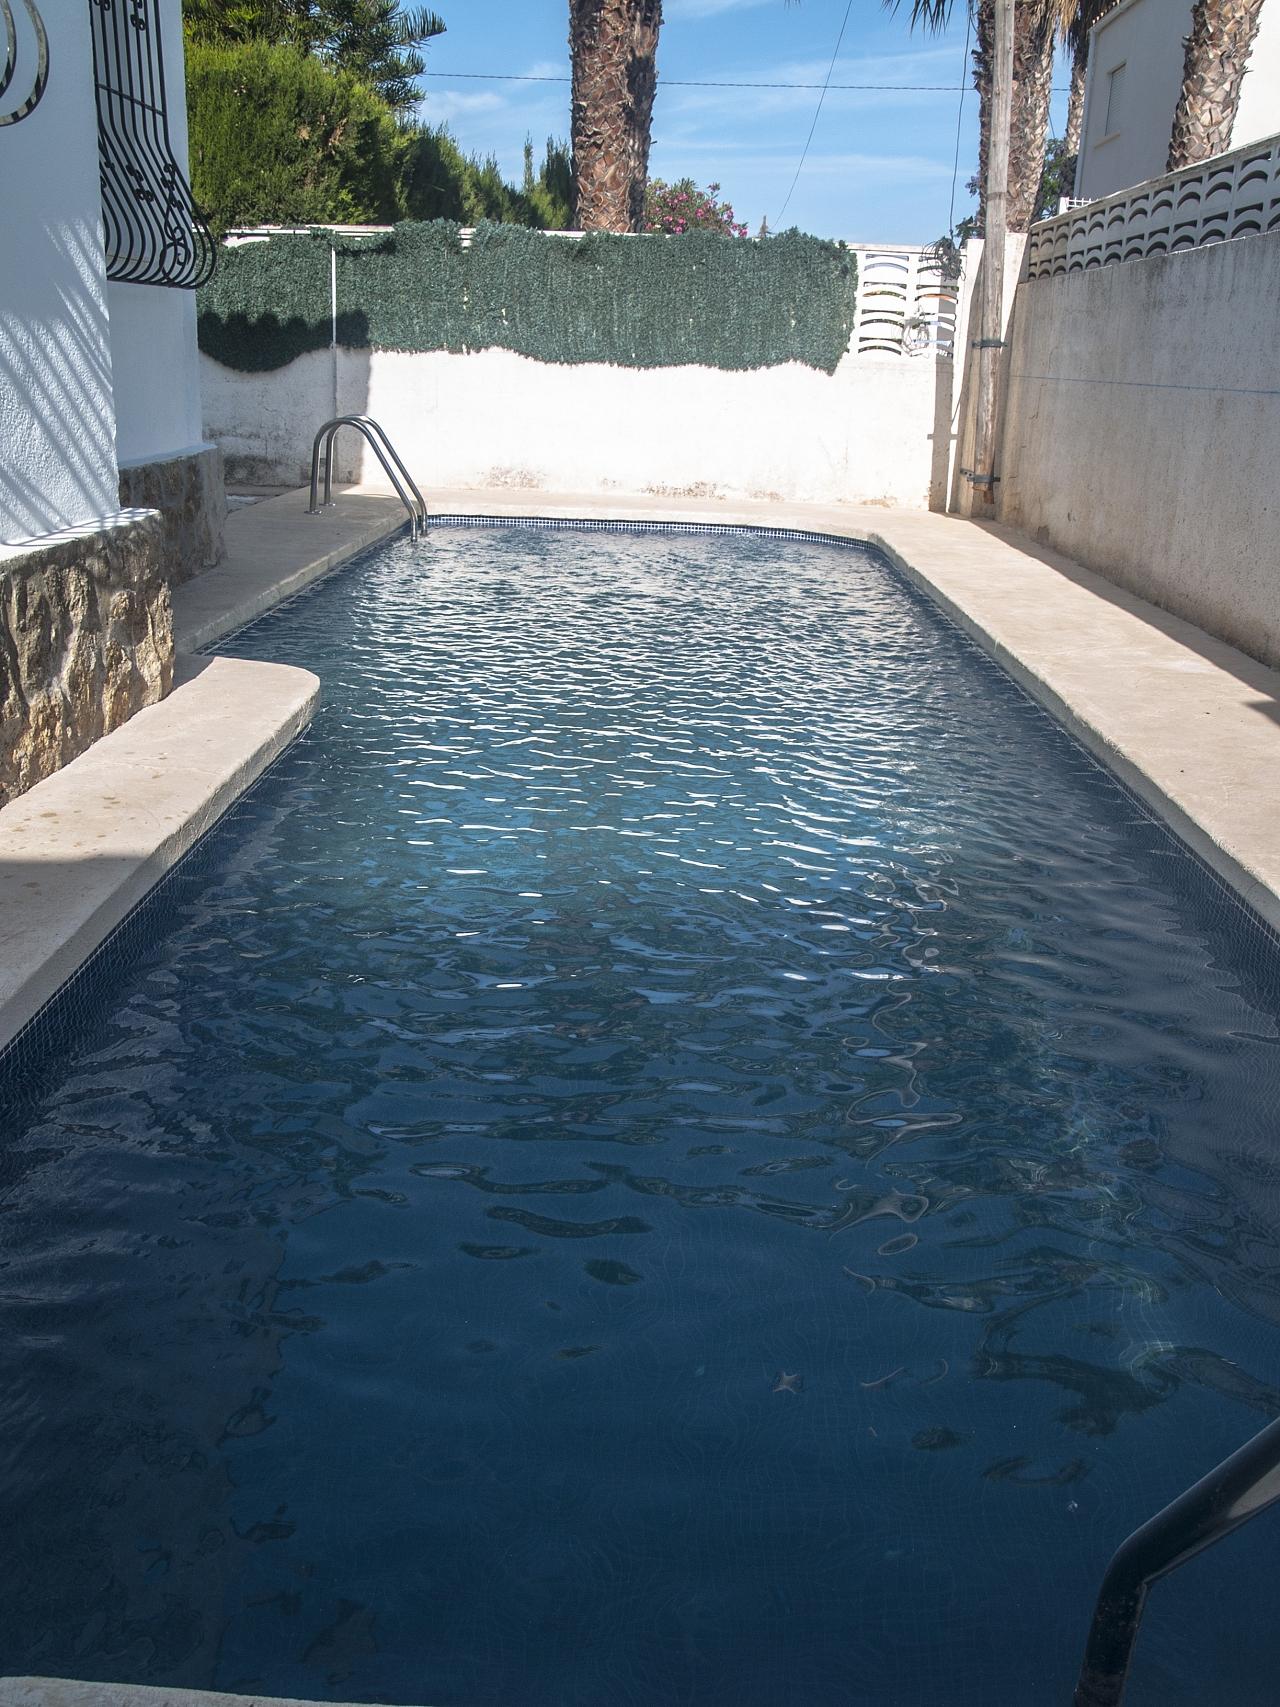 Vida del proyecto piscina privada els poblets - Proyecto piscina privada ...